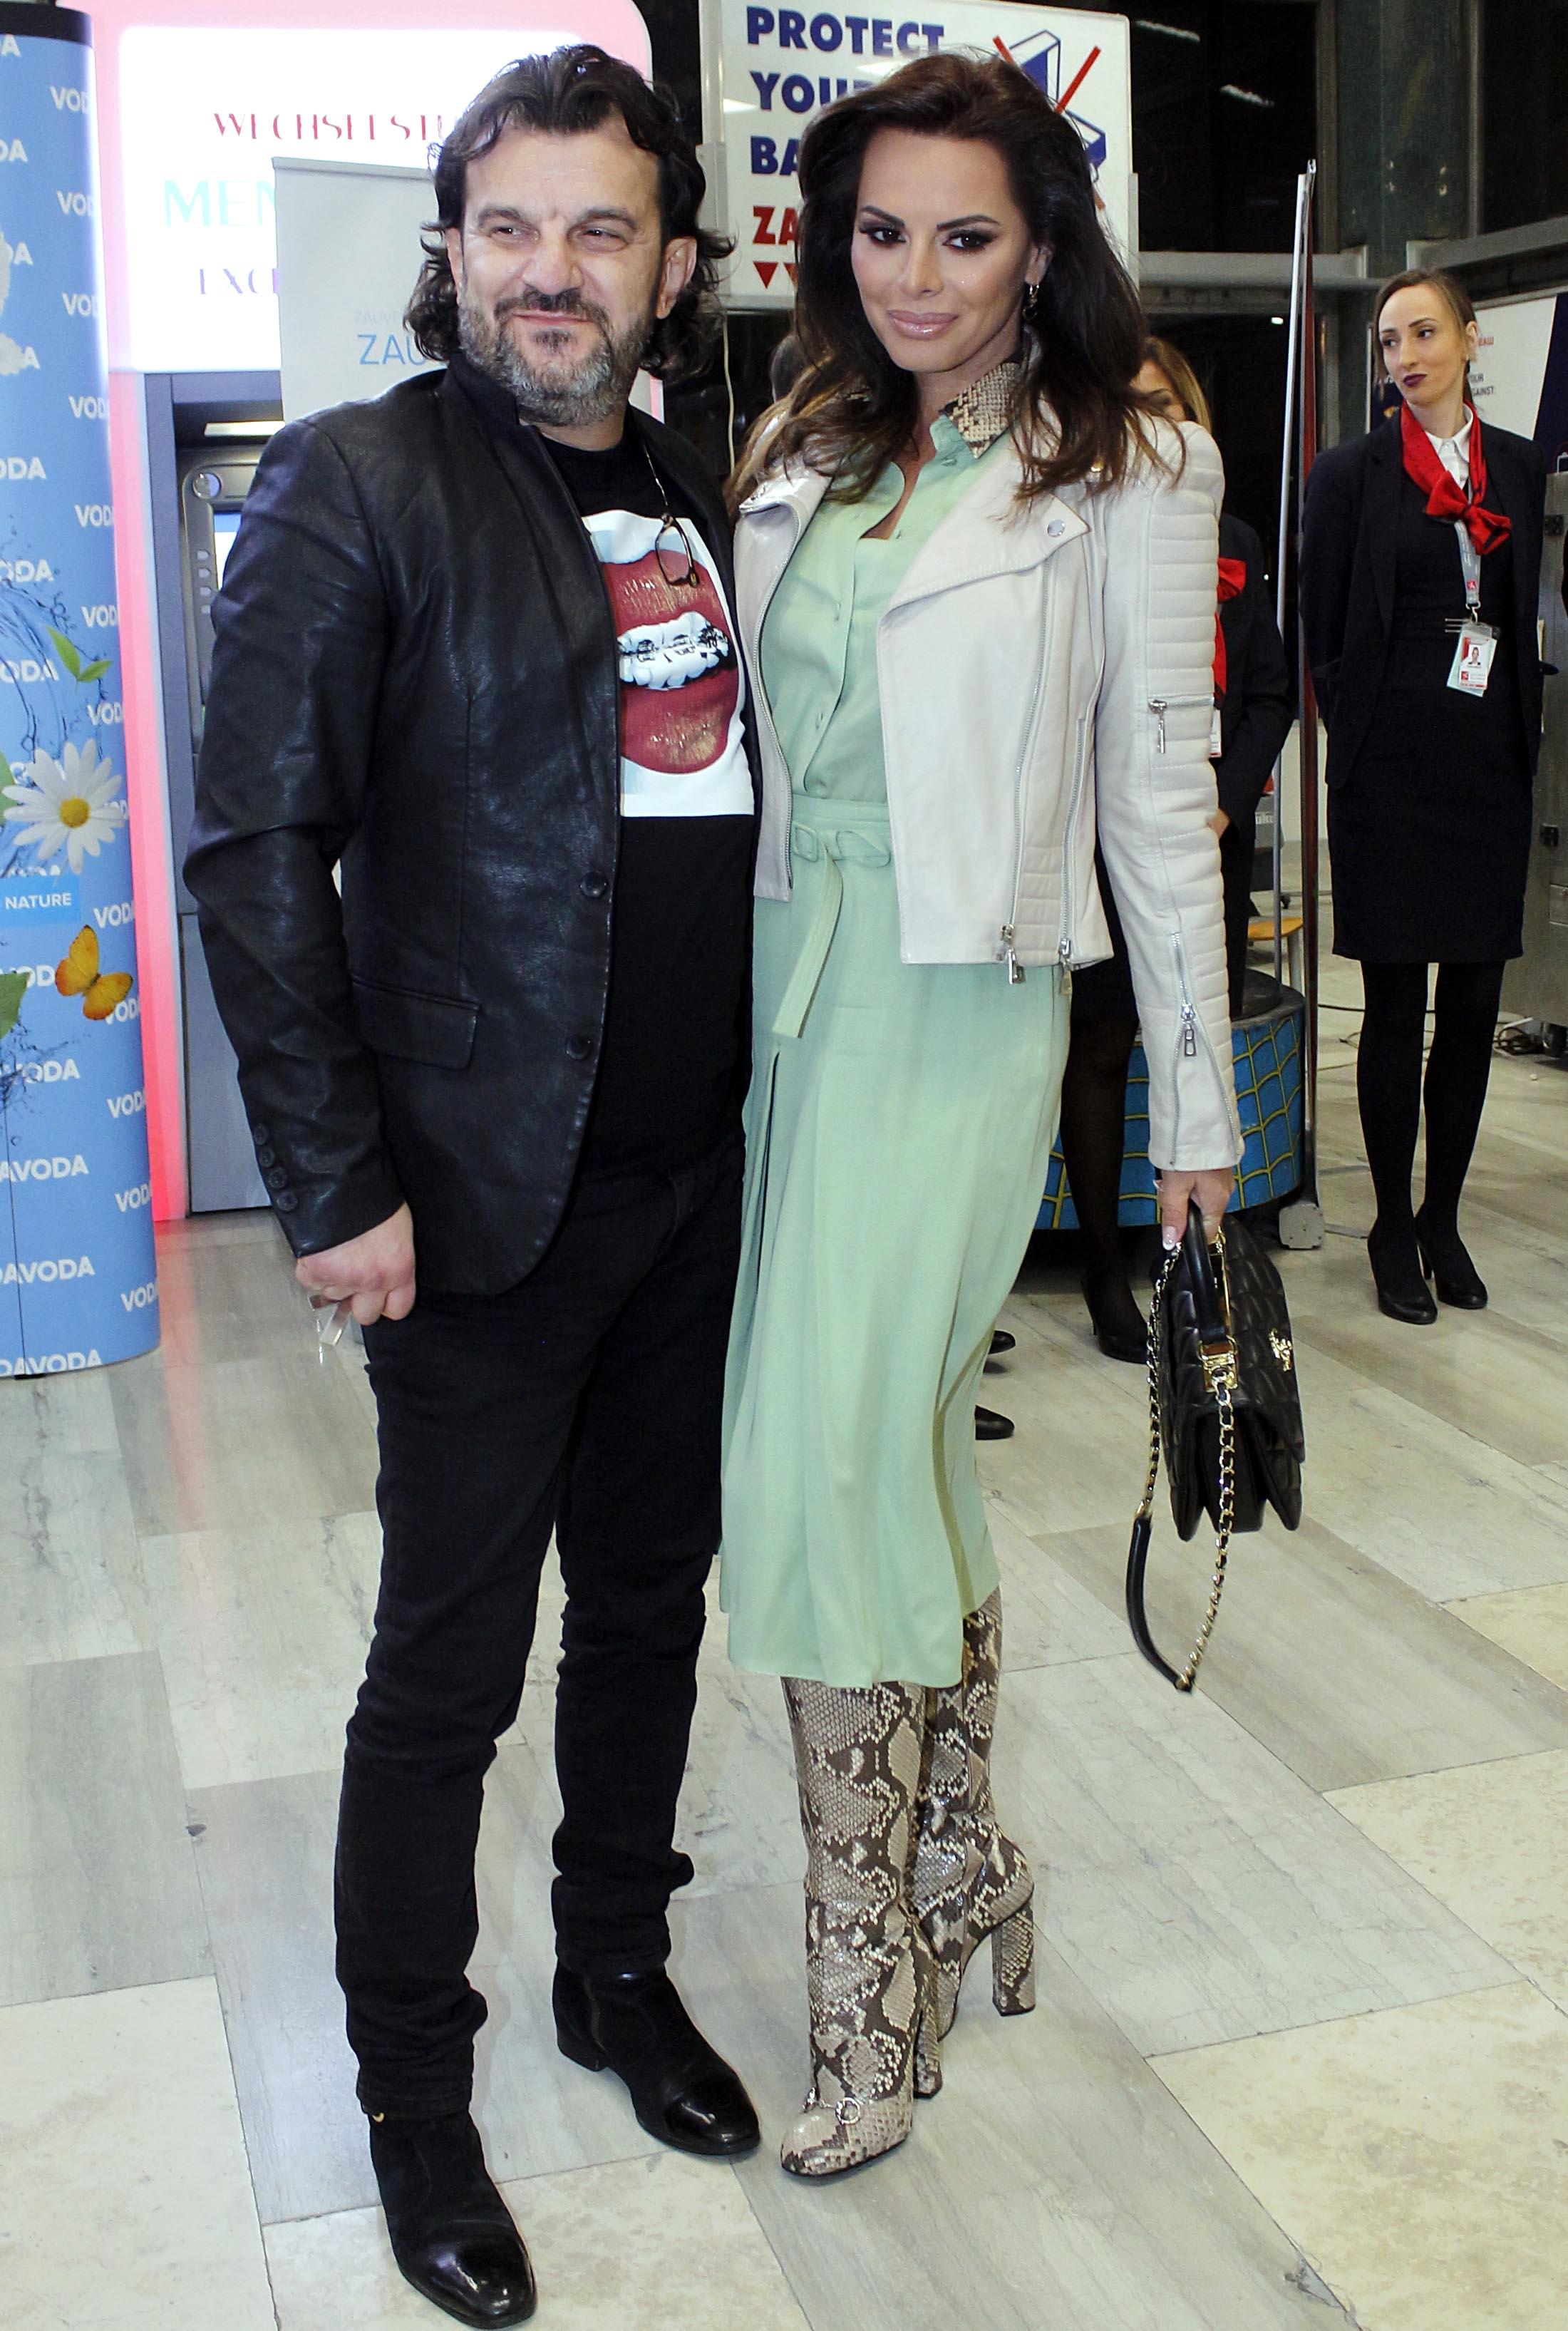 Aca i Sonja Lukas